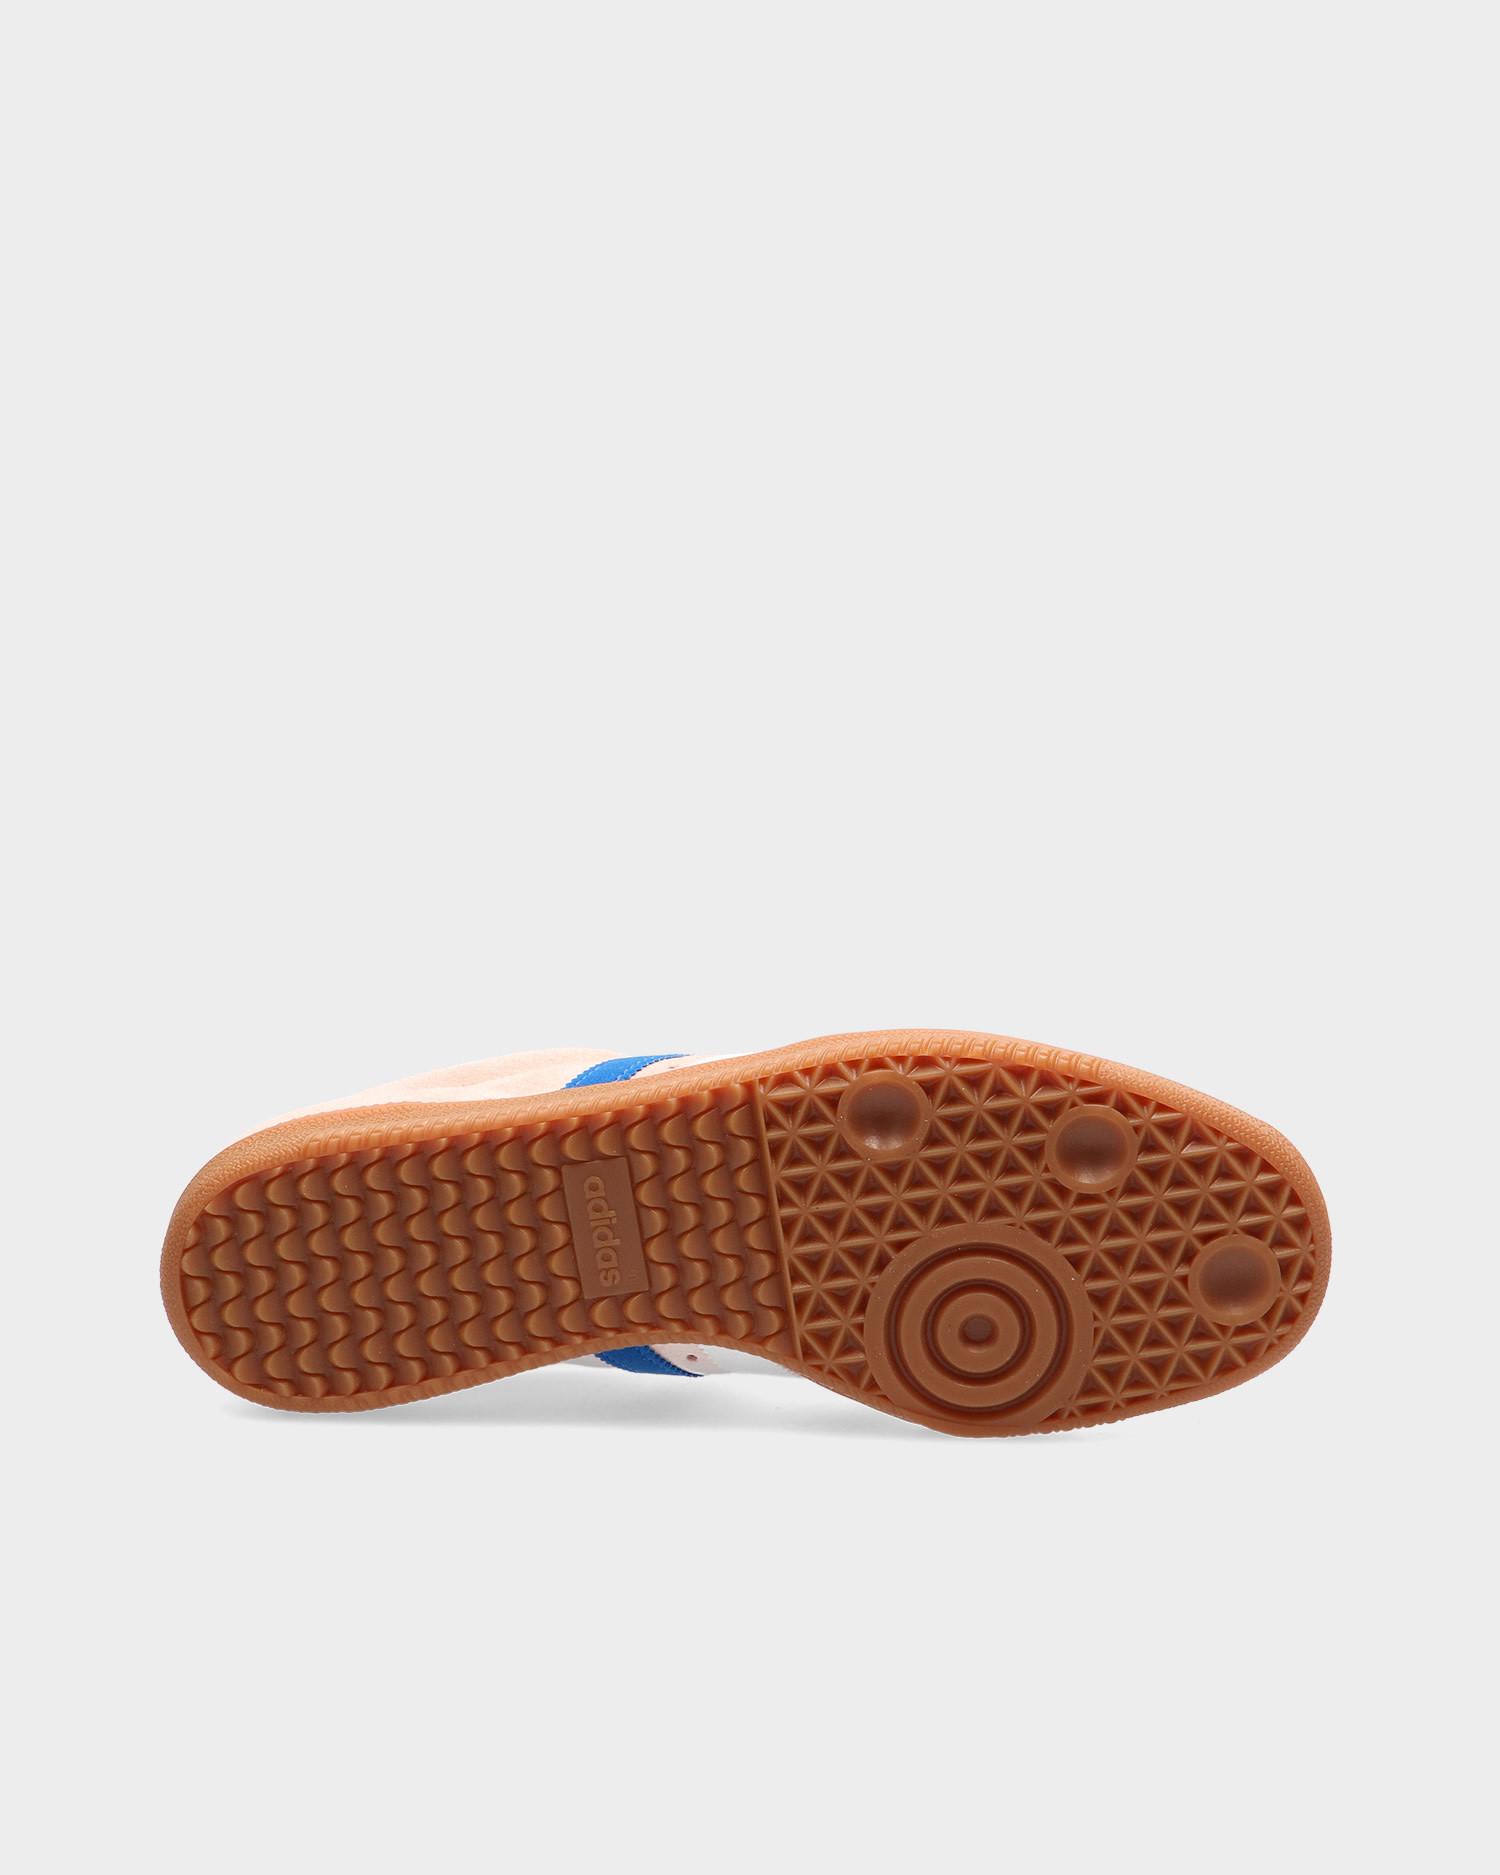 Adidas Padiham Glopnk/Blusld/Vivred